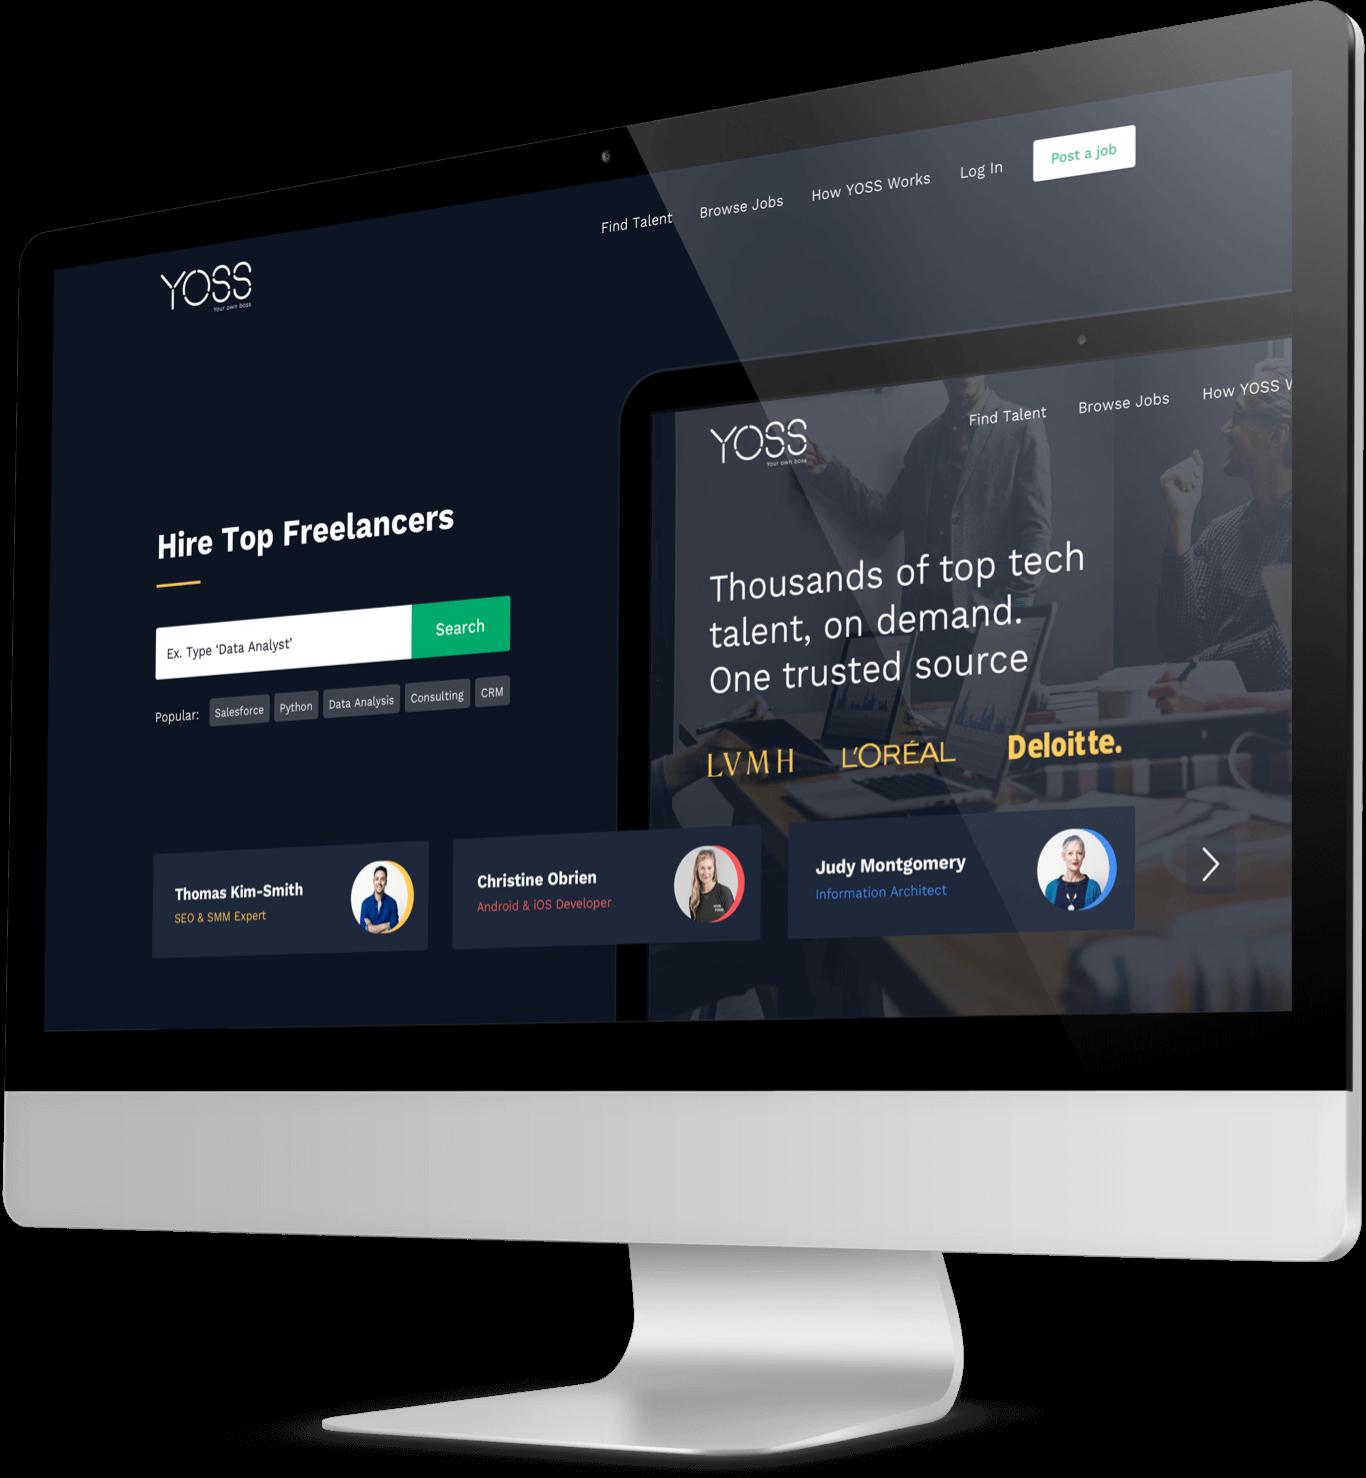 Yoss' website displayed on desktop